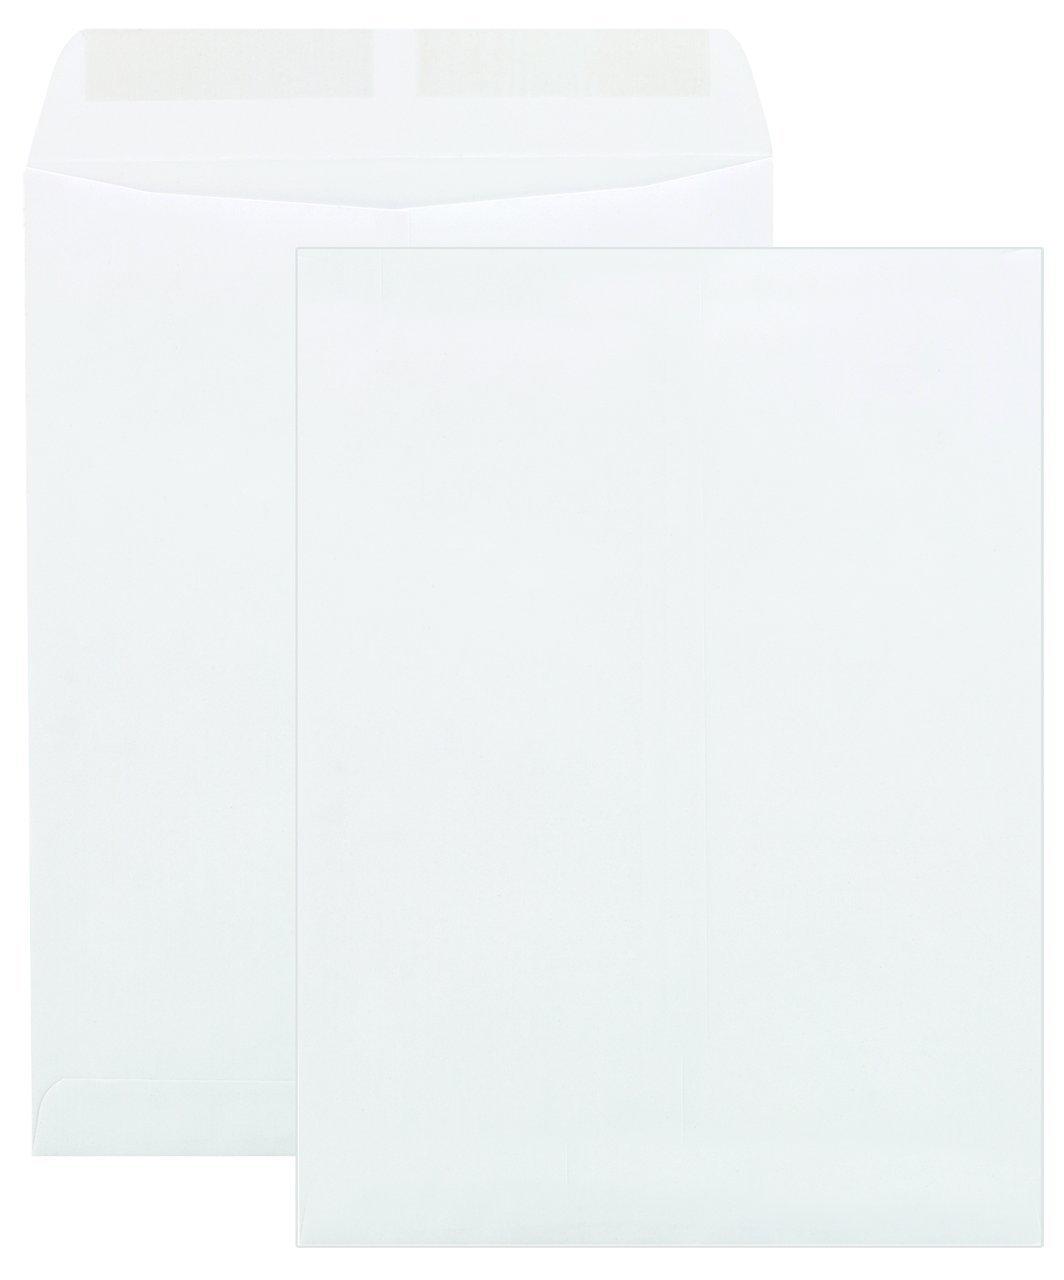 Columbian White Gummed 9 x 12 Inch Columbian Catalog Envelopes 100 Count (CO662)